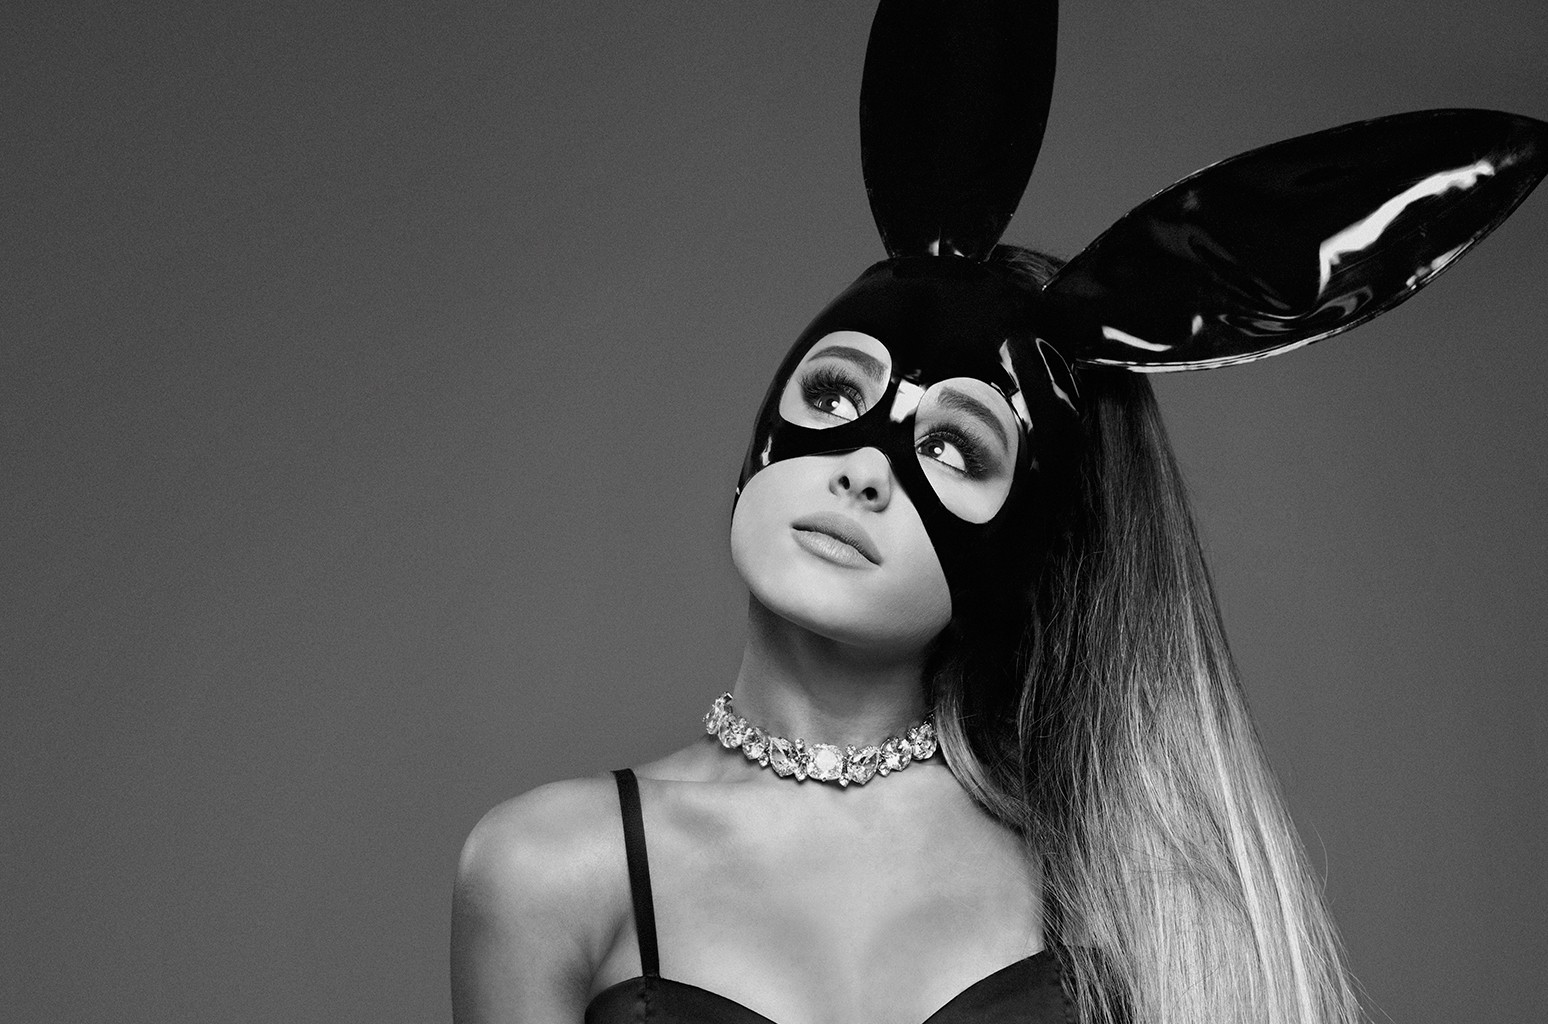 Ariana Grande S 10 Realest Lyrics On Her Dangerous Woman Album Billboard Ariana grande, chaka khan, ariana grande & chaka khan. her dangerous woman album billboard